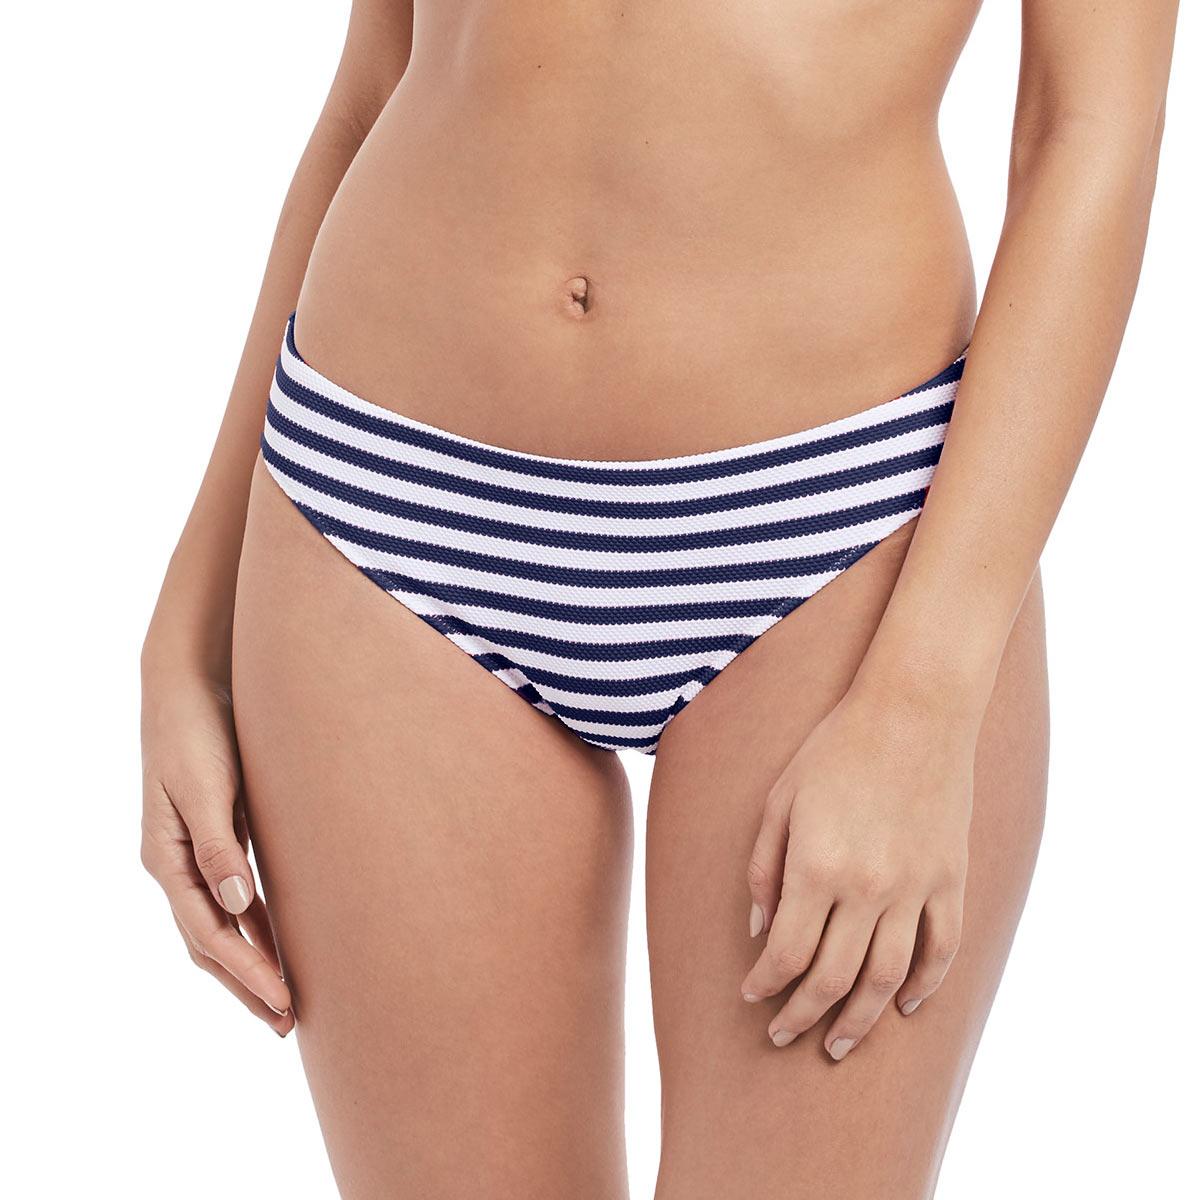 Maillot de bain culotte couvrante rayée bleue Drift Away (Bas)